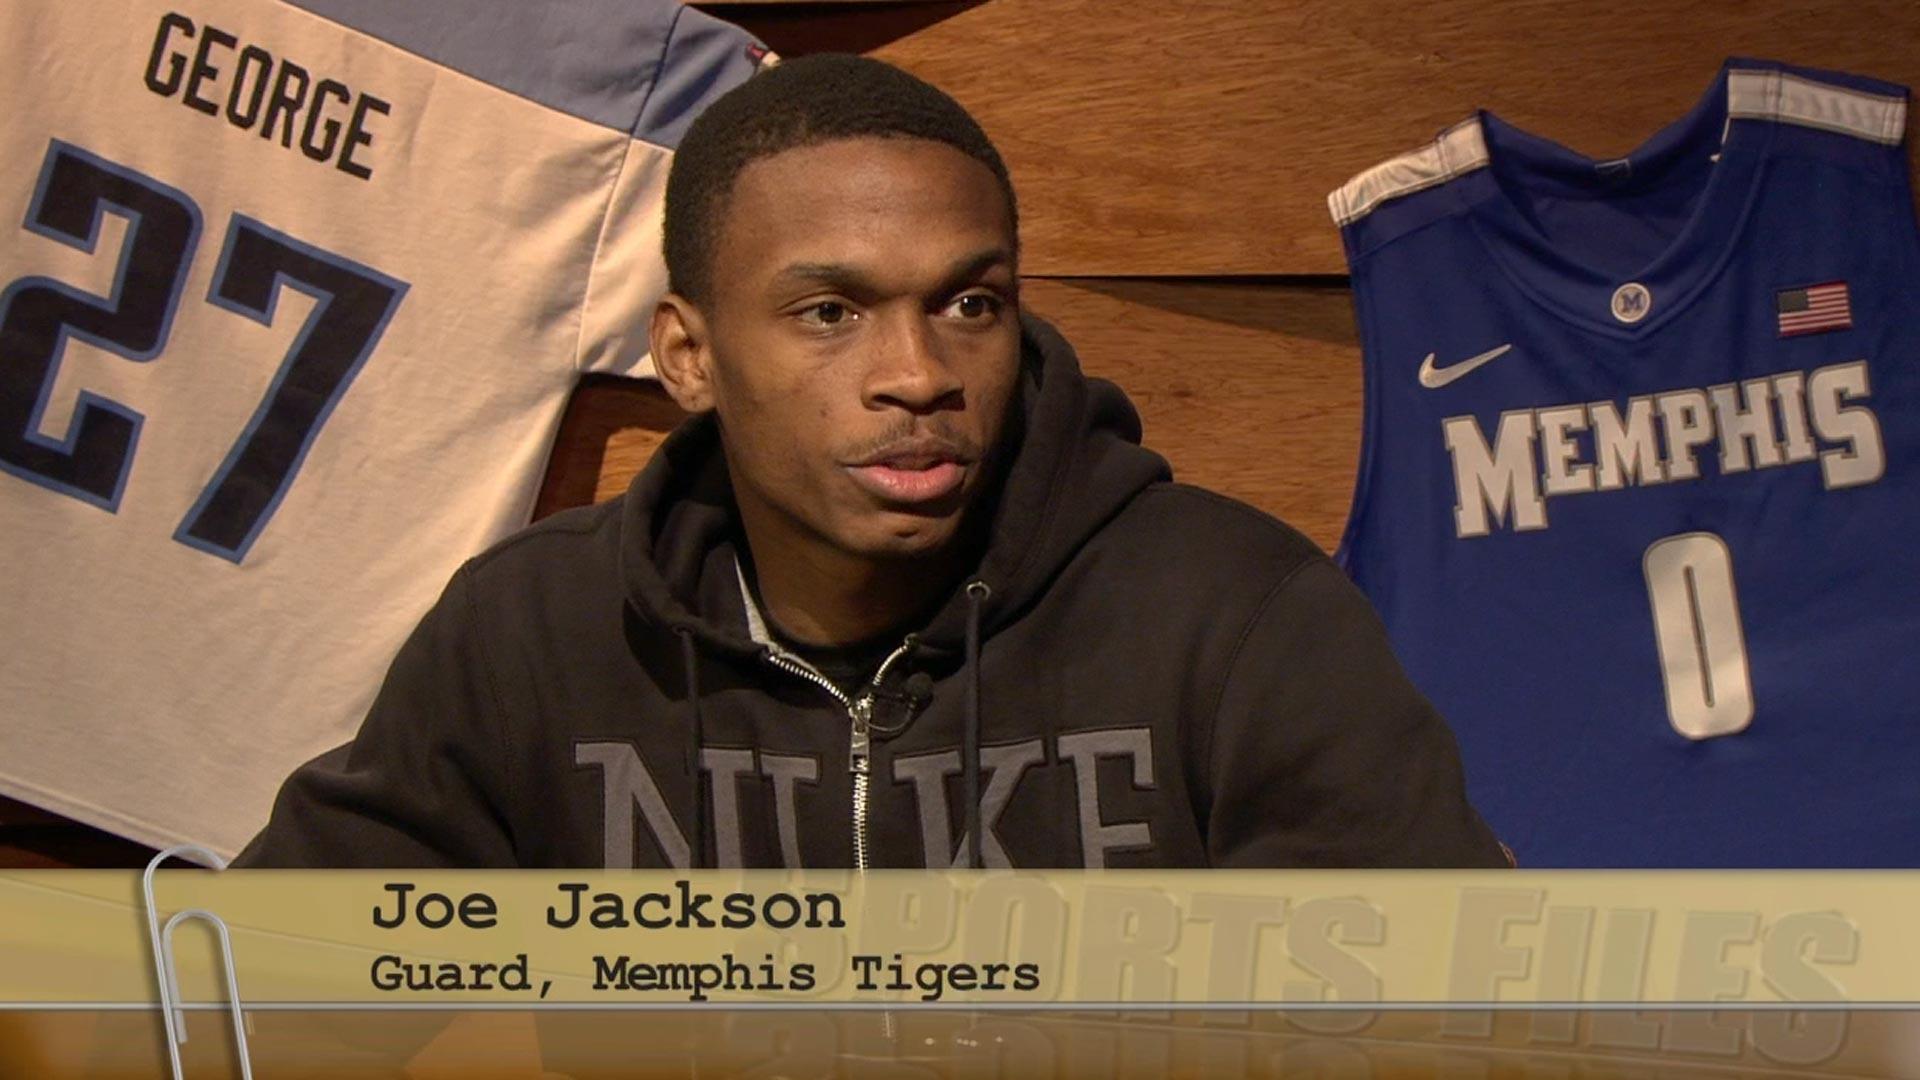 outlet store 0ba81 0f49e Joe Jackson - Guard for The University of Memphis Tigers ...